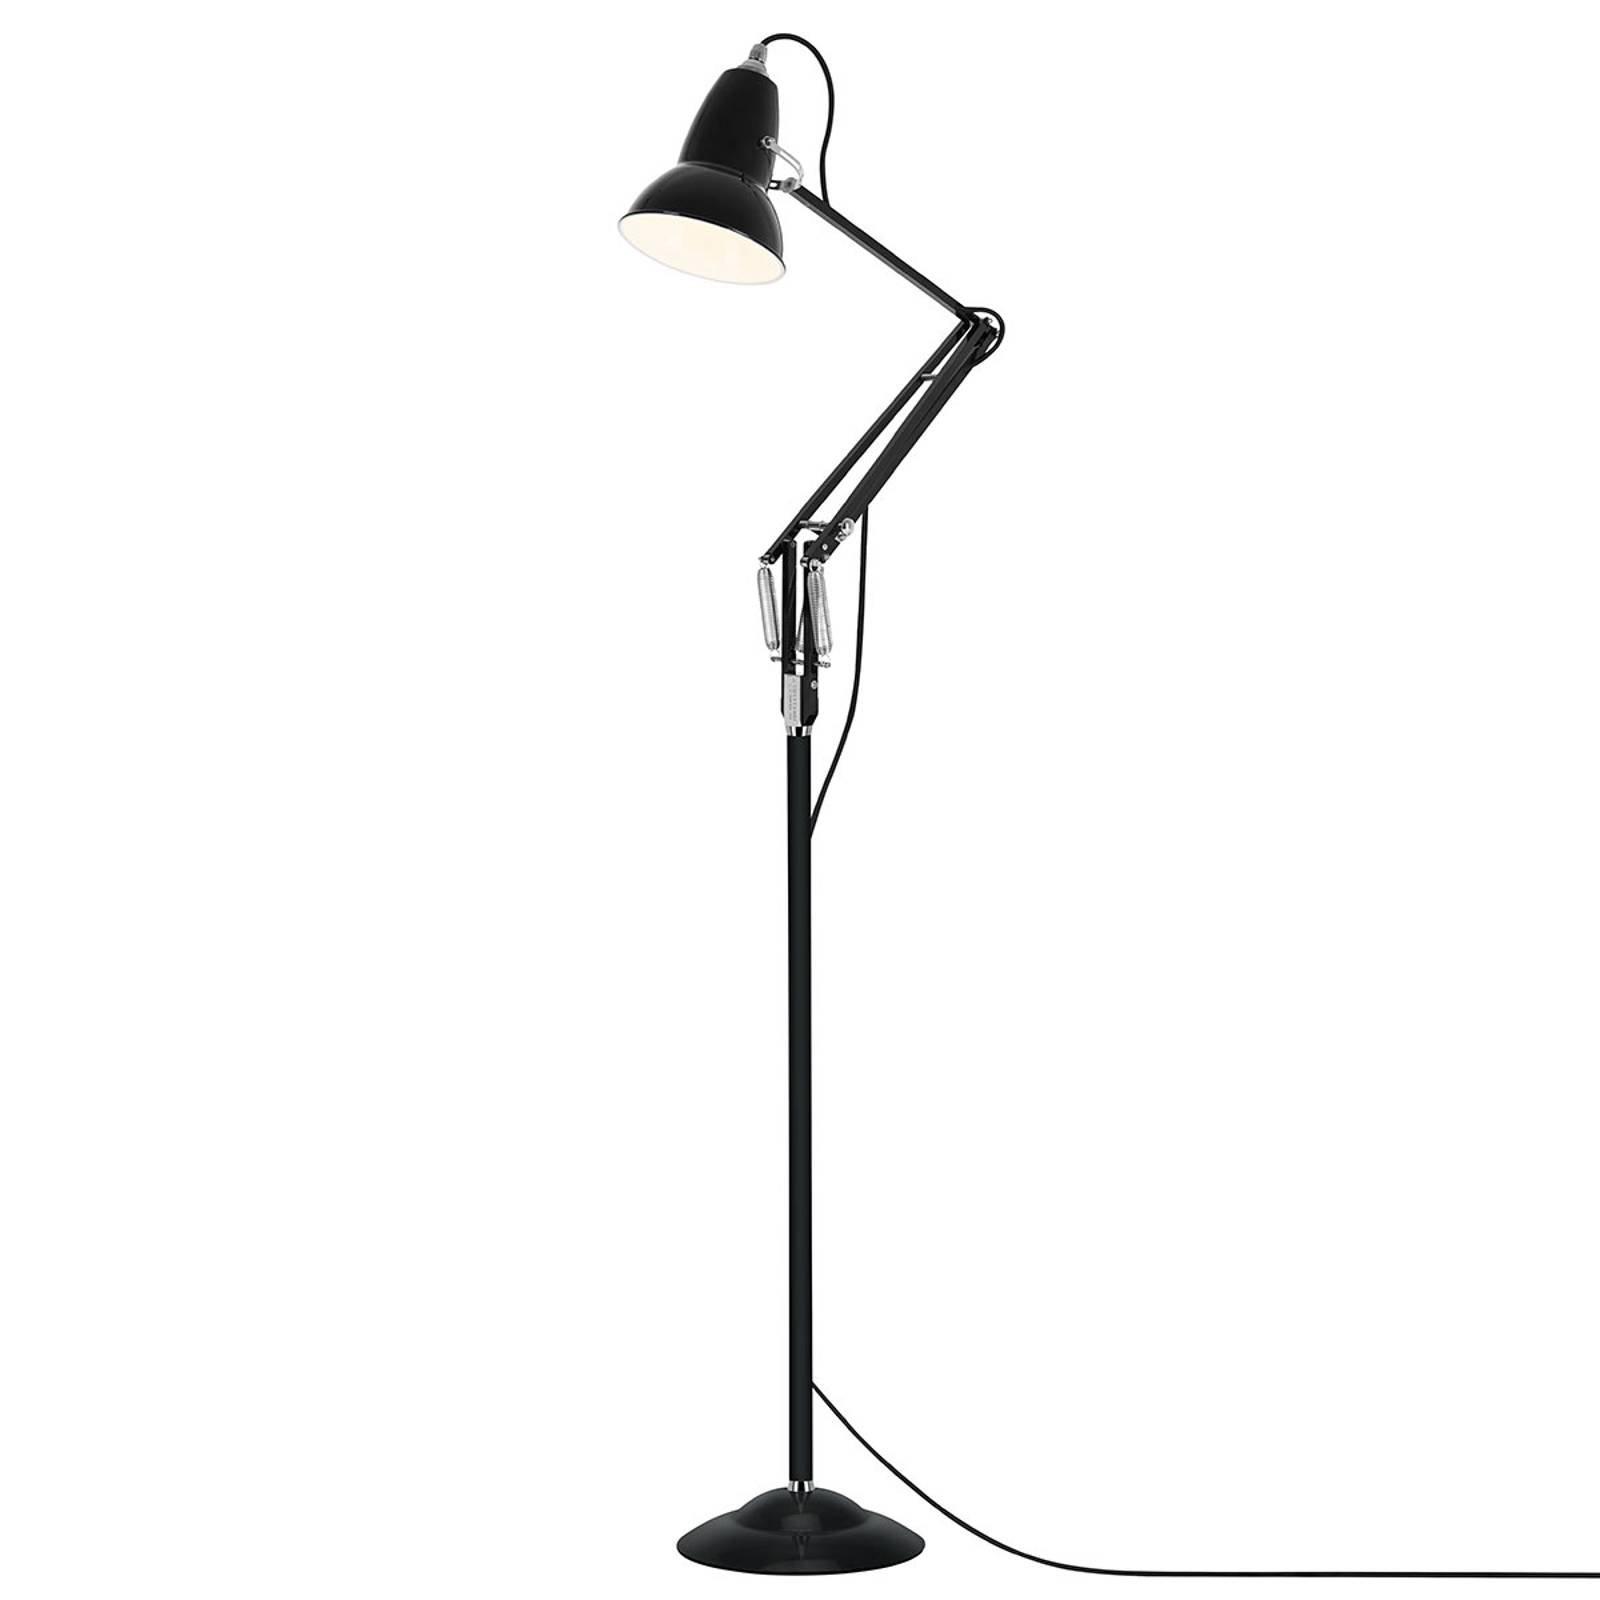 Anglepoise Original 1227 gulvlampe fløyelsvart